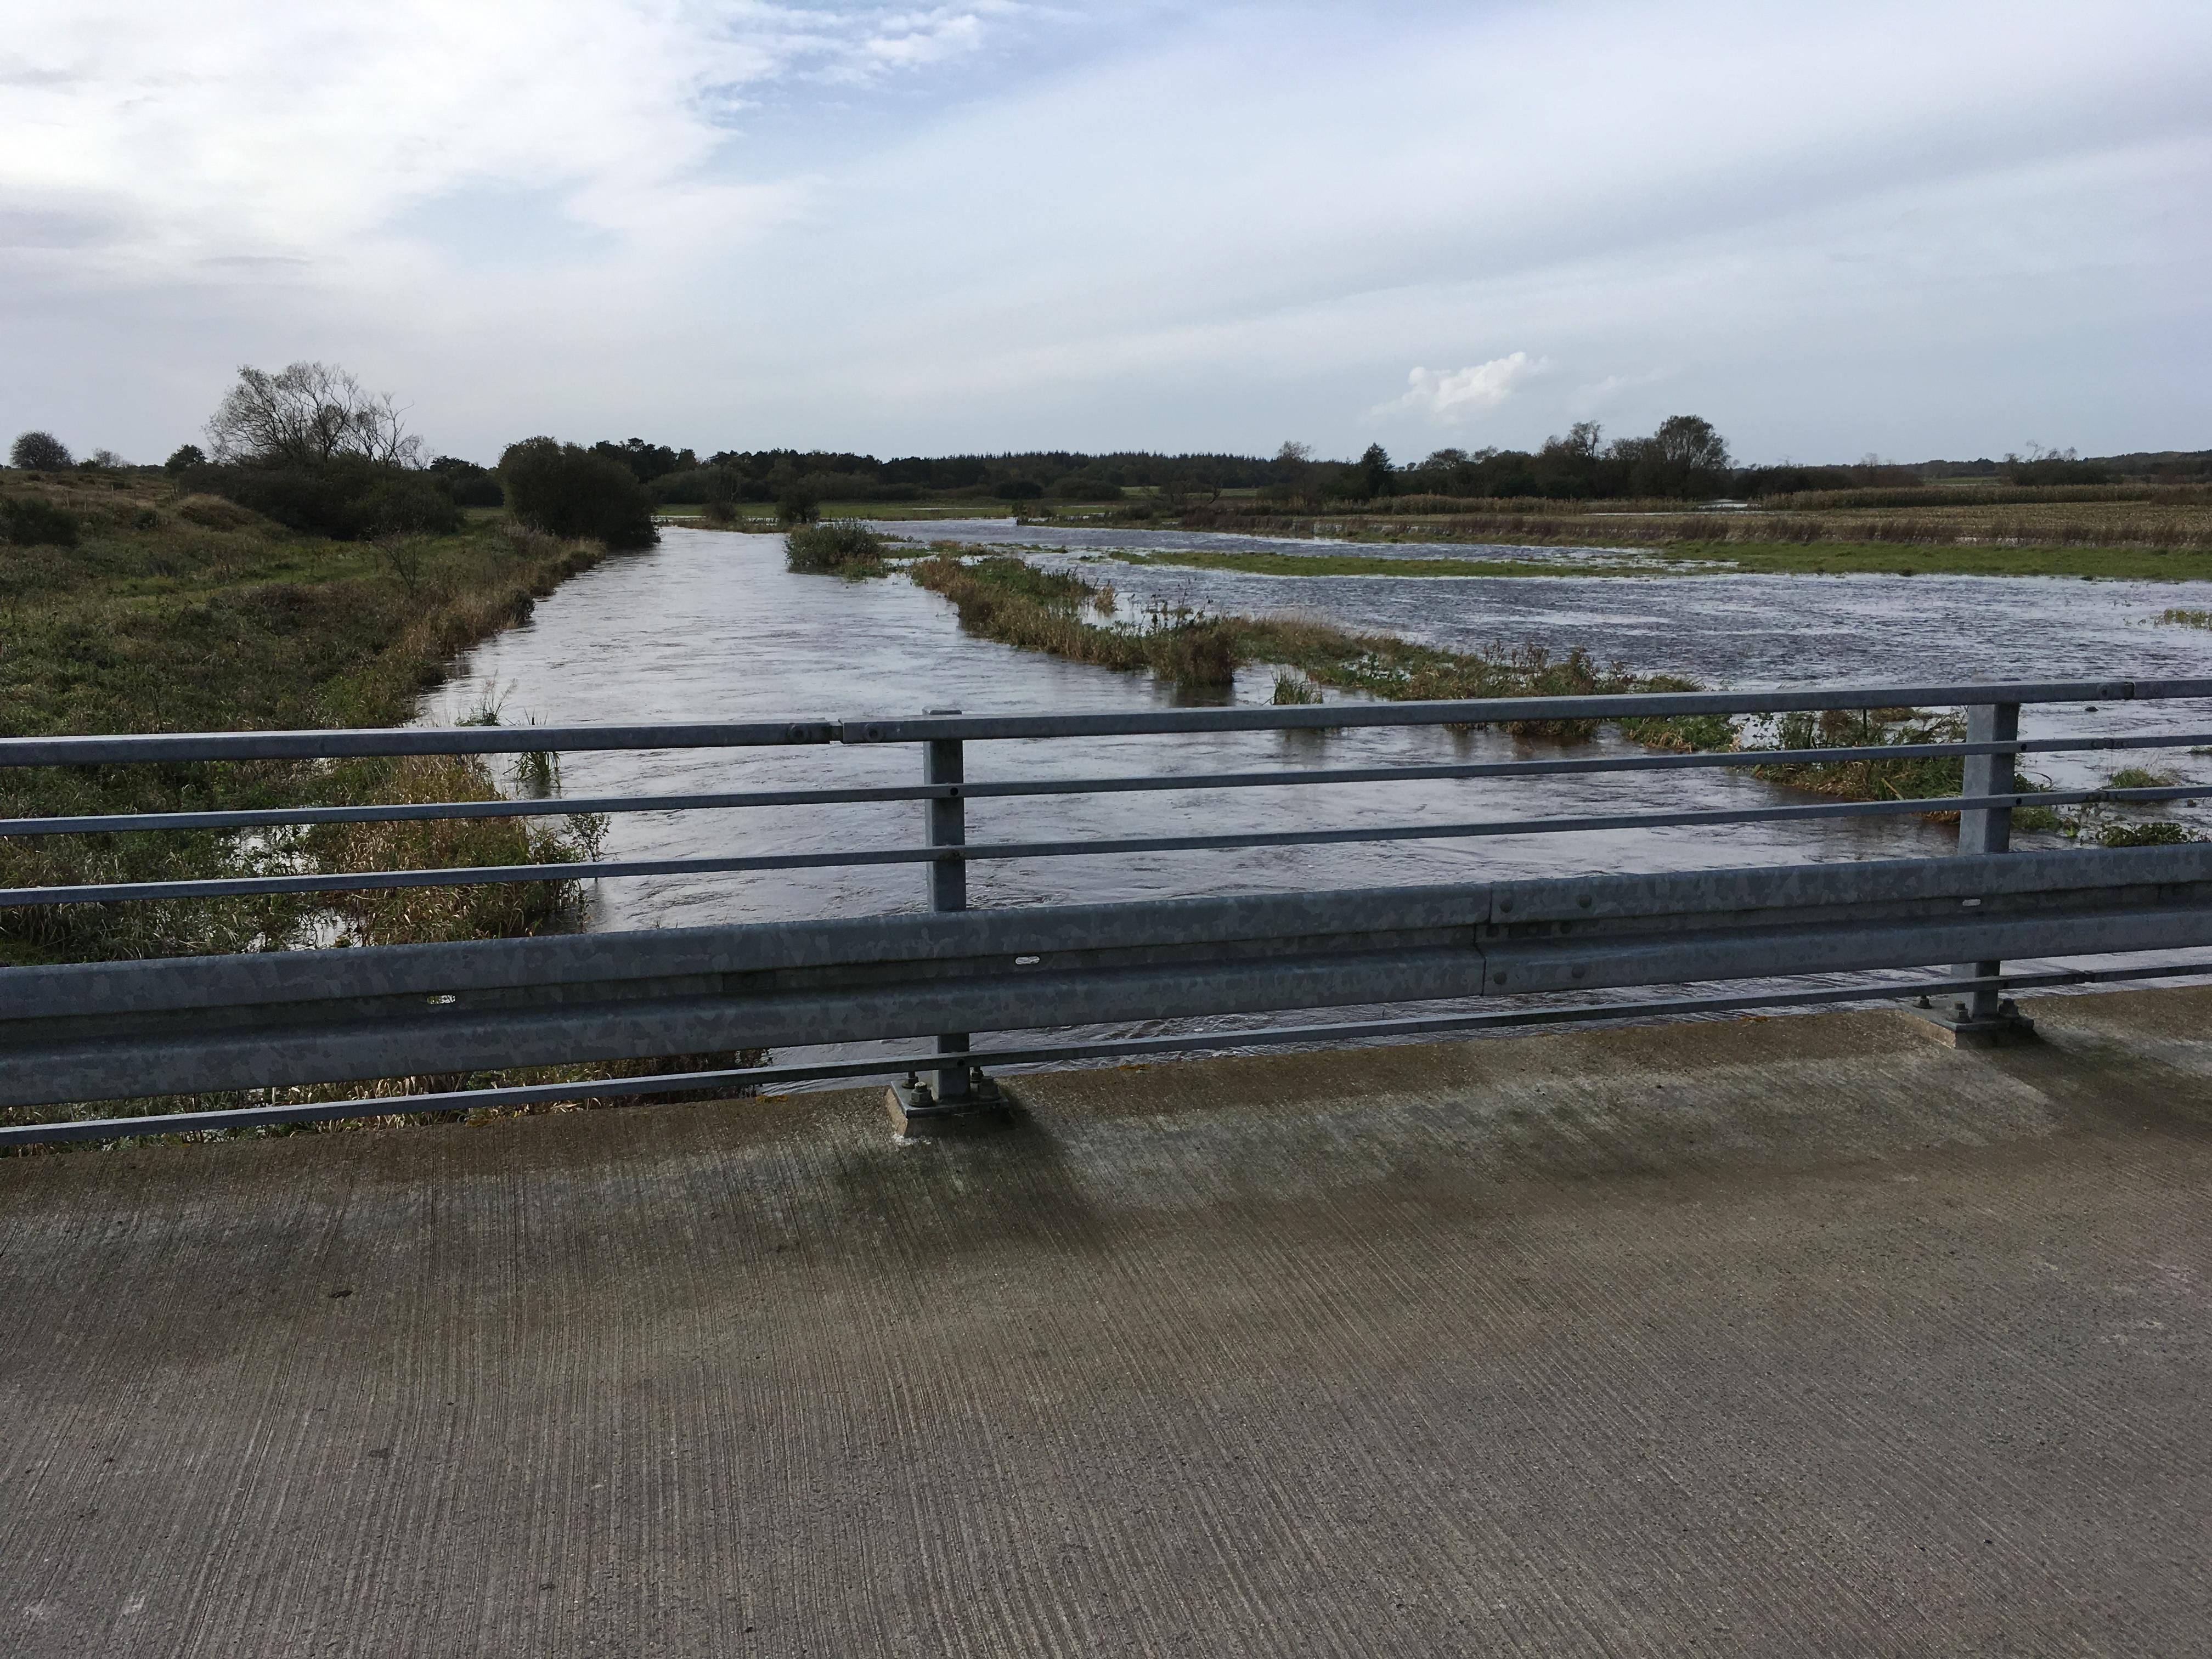 Flads å nedstrøms Harreby bro